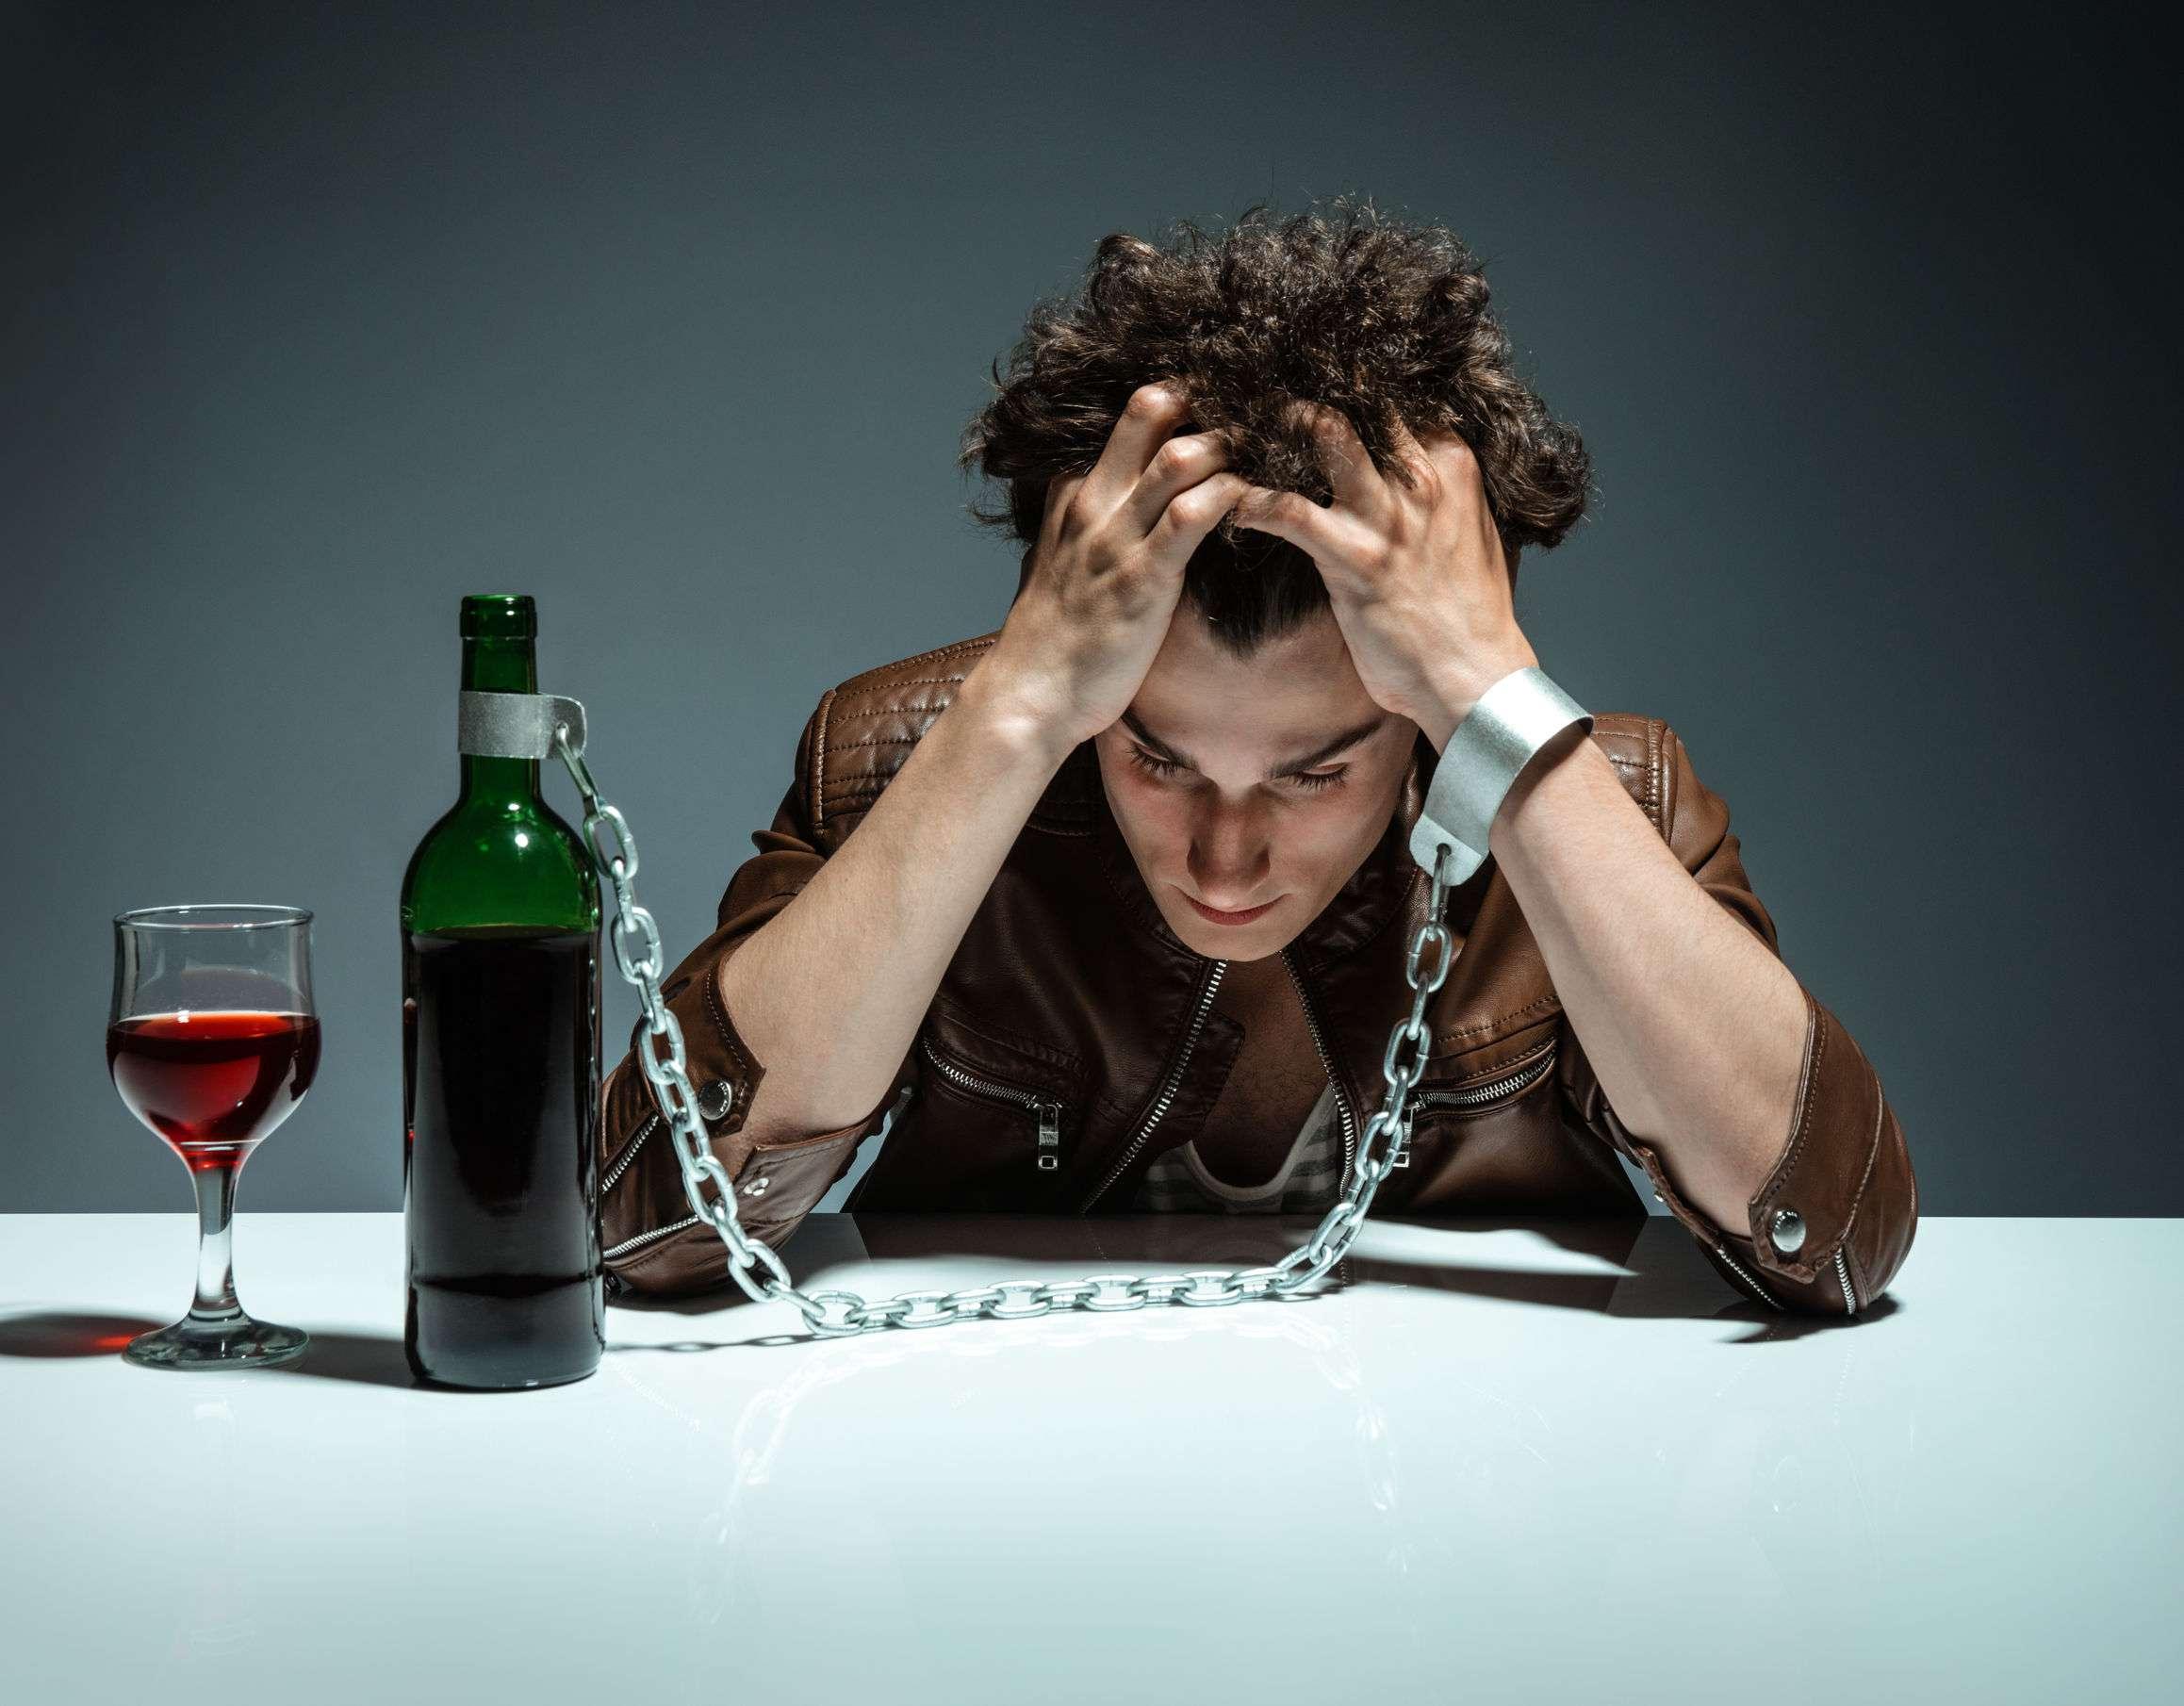 Професійна допомога наркоманам і алкоголікам